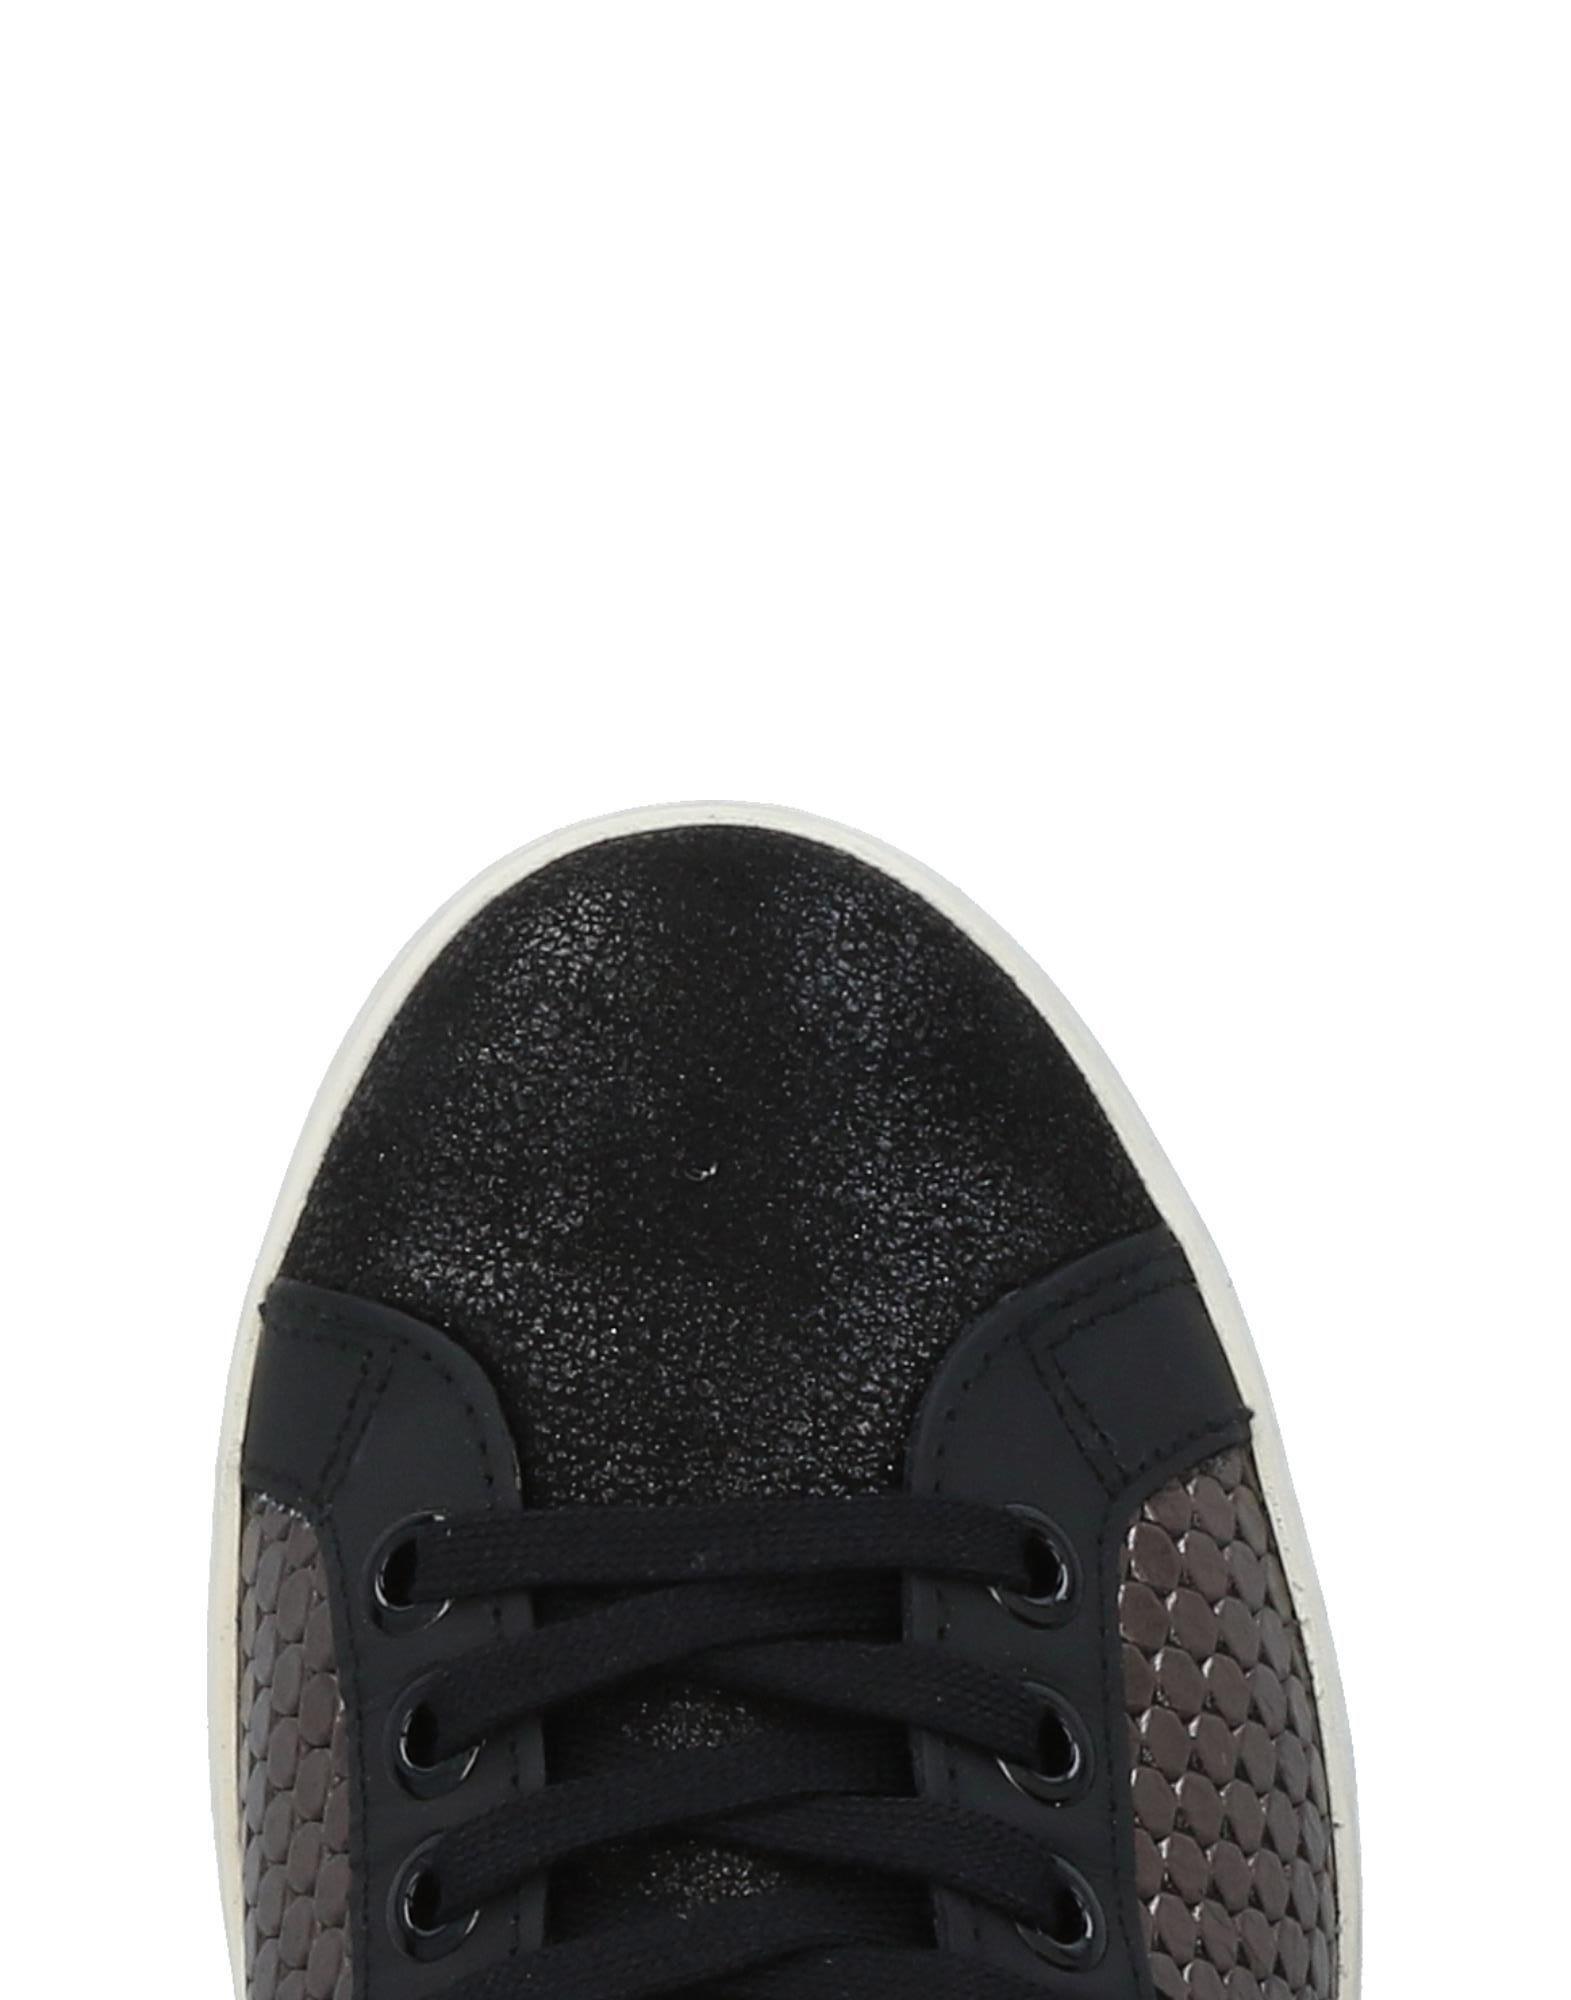 Moda Sneakers D.A.T.E. Donna Donna D.A.T.E. - 11491795CB 3a9867